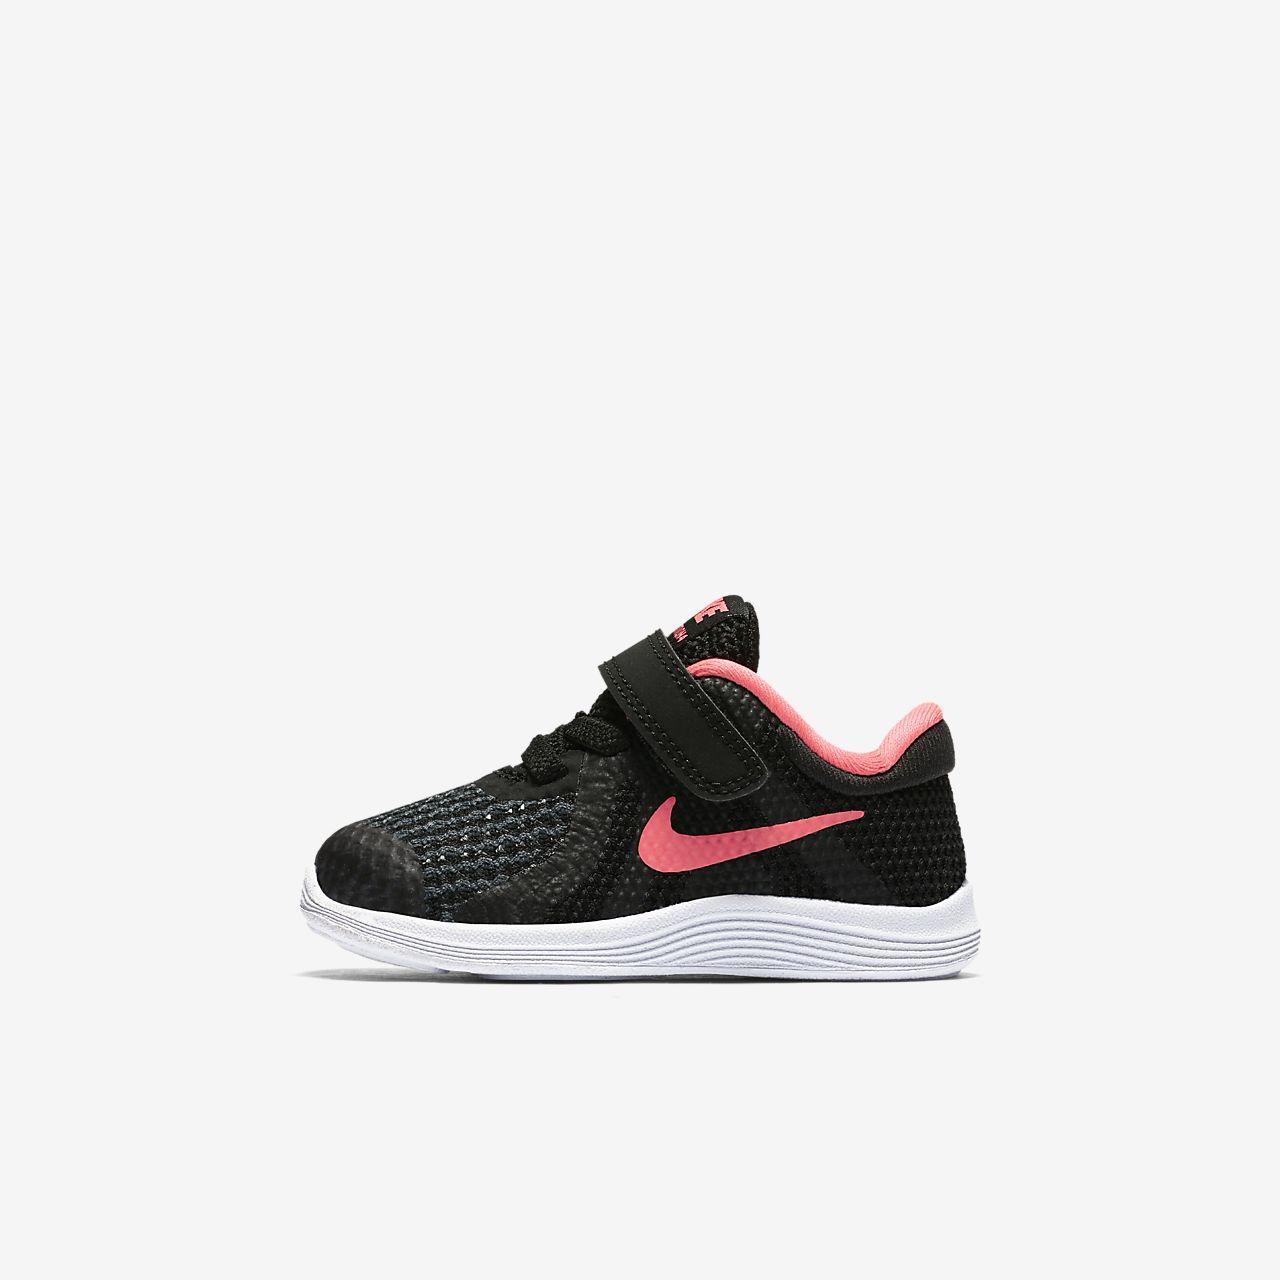 Cipő Revolution Cipő Nike BabáknakHu 4 Nike BabáknakHu Revolution 4 8OknP0w